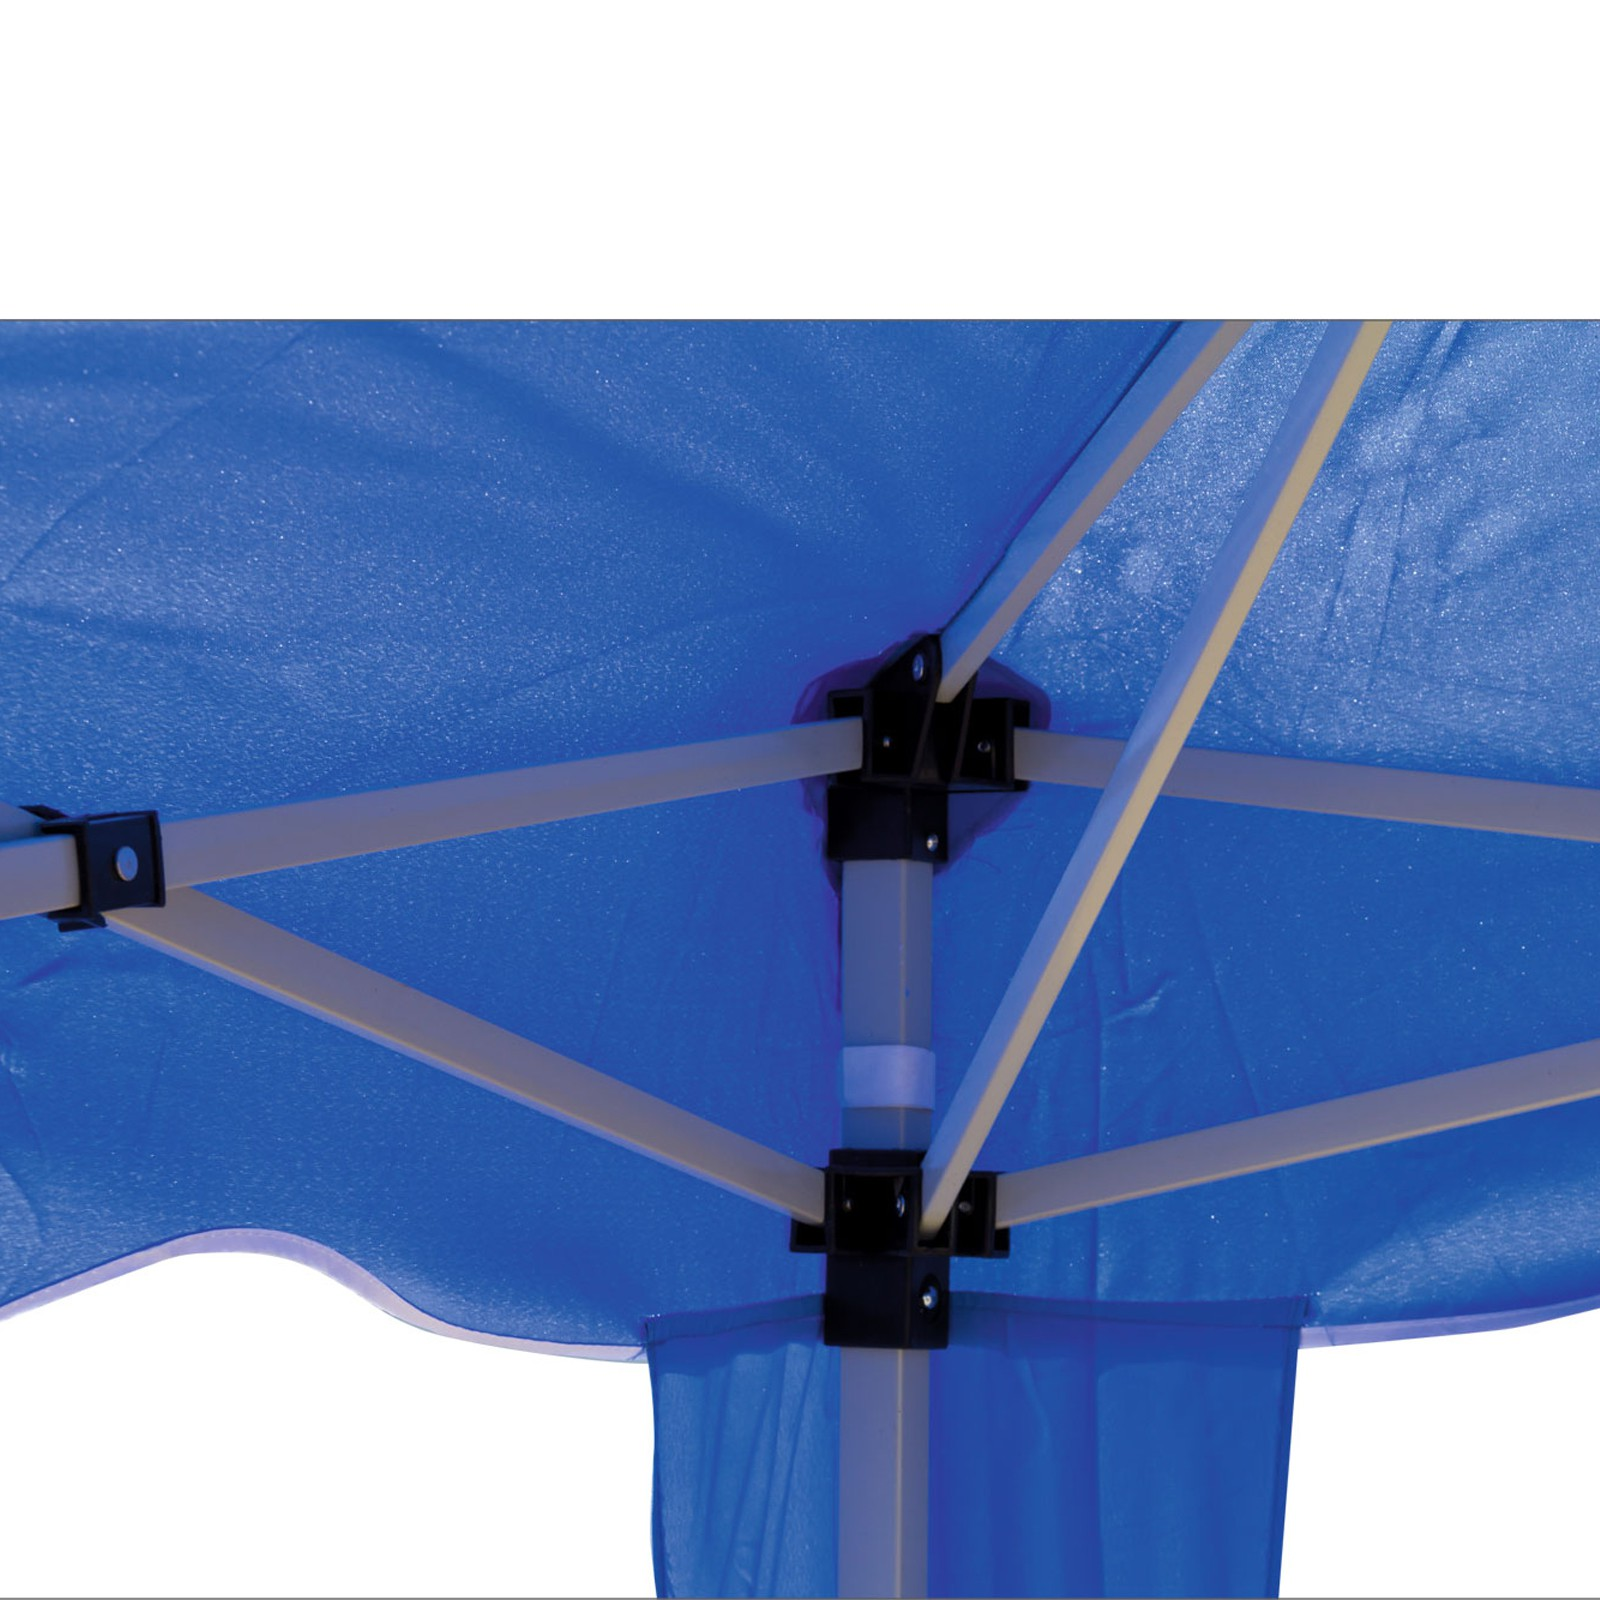 gartenpavillon faltpavillon alu metall 3x3 meter hellblau gartenzelt partyzelt 4031765142151 ebay. Black Bedroom Furniture Sets. Home Design Ideas